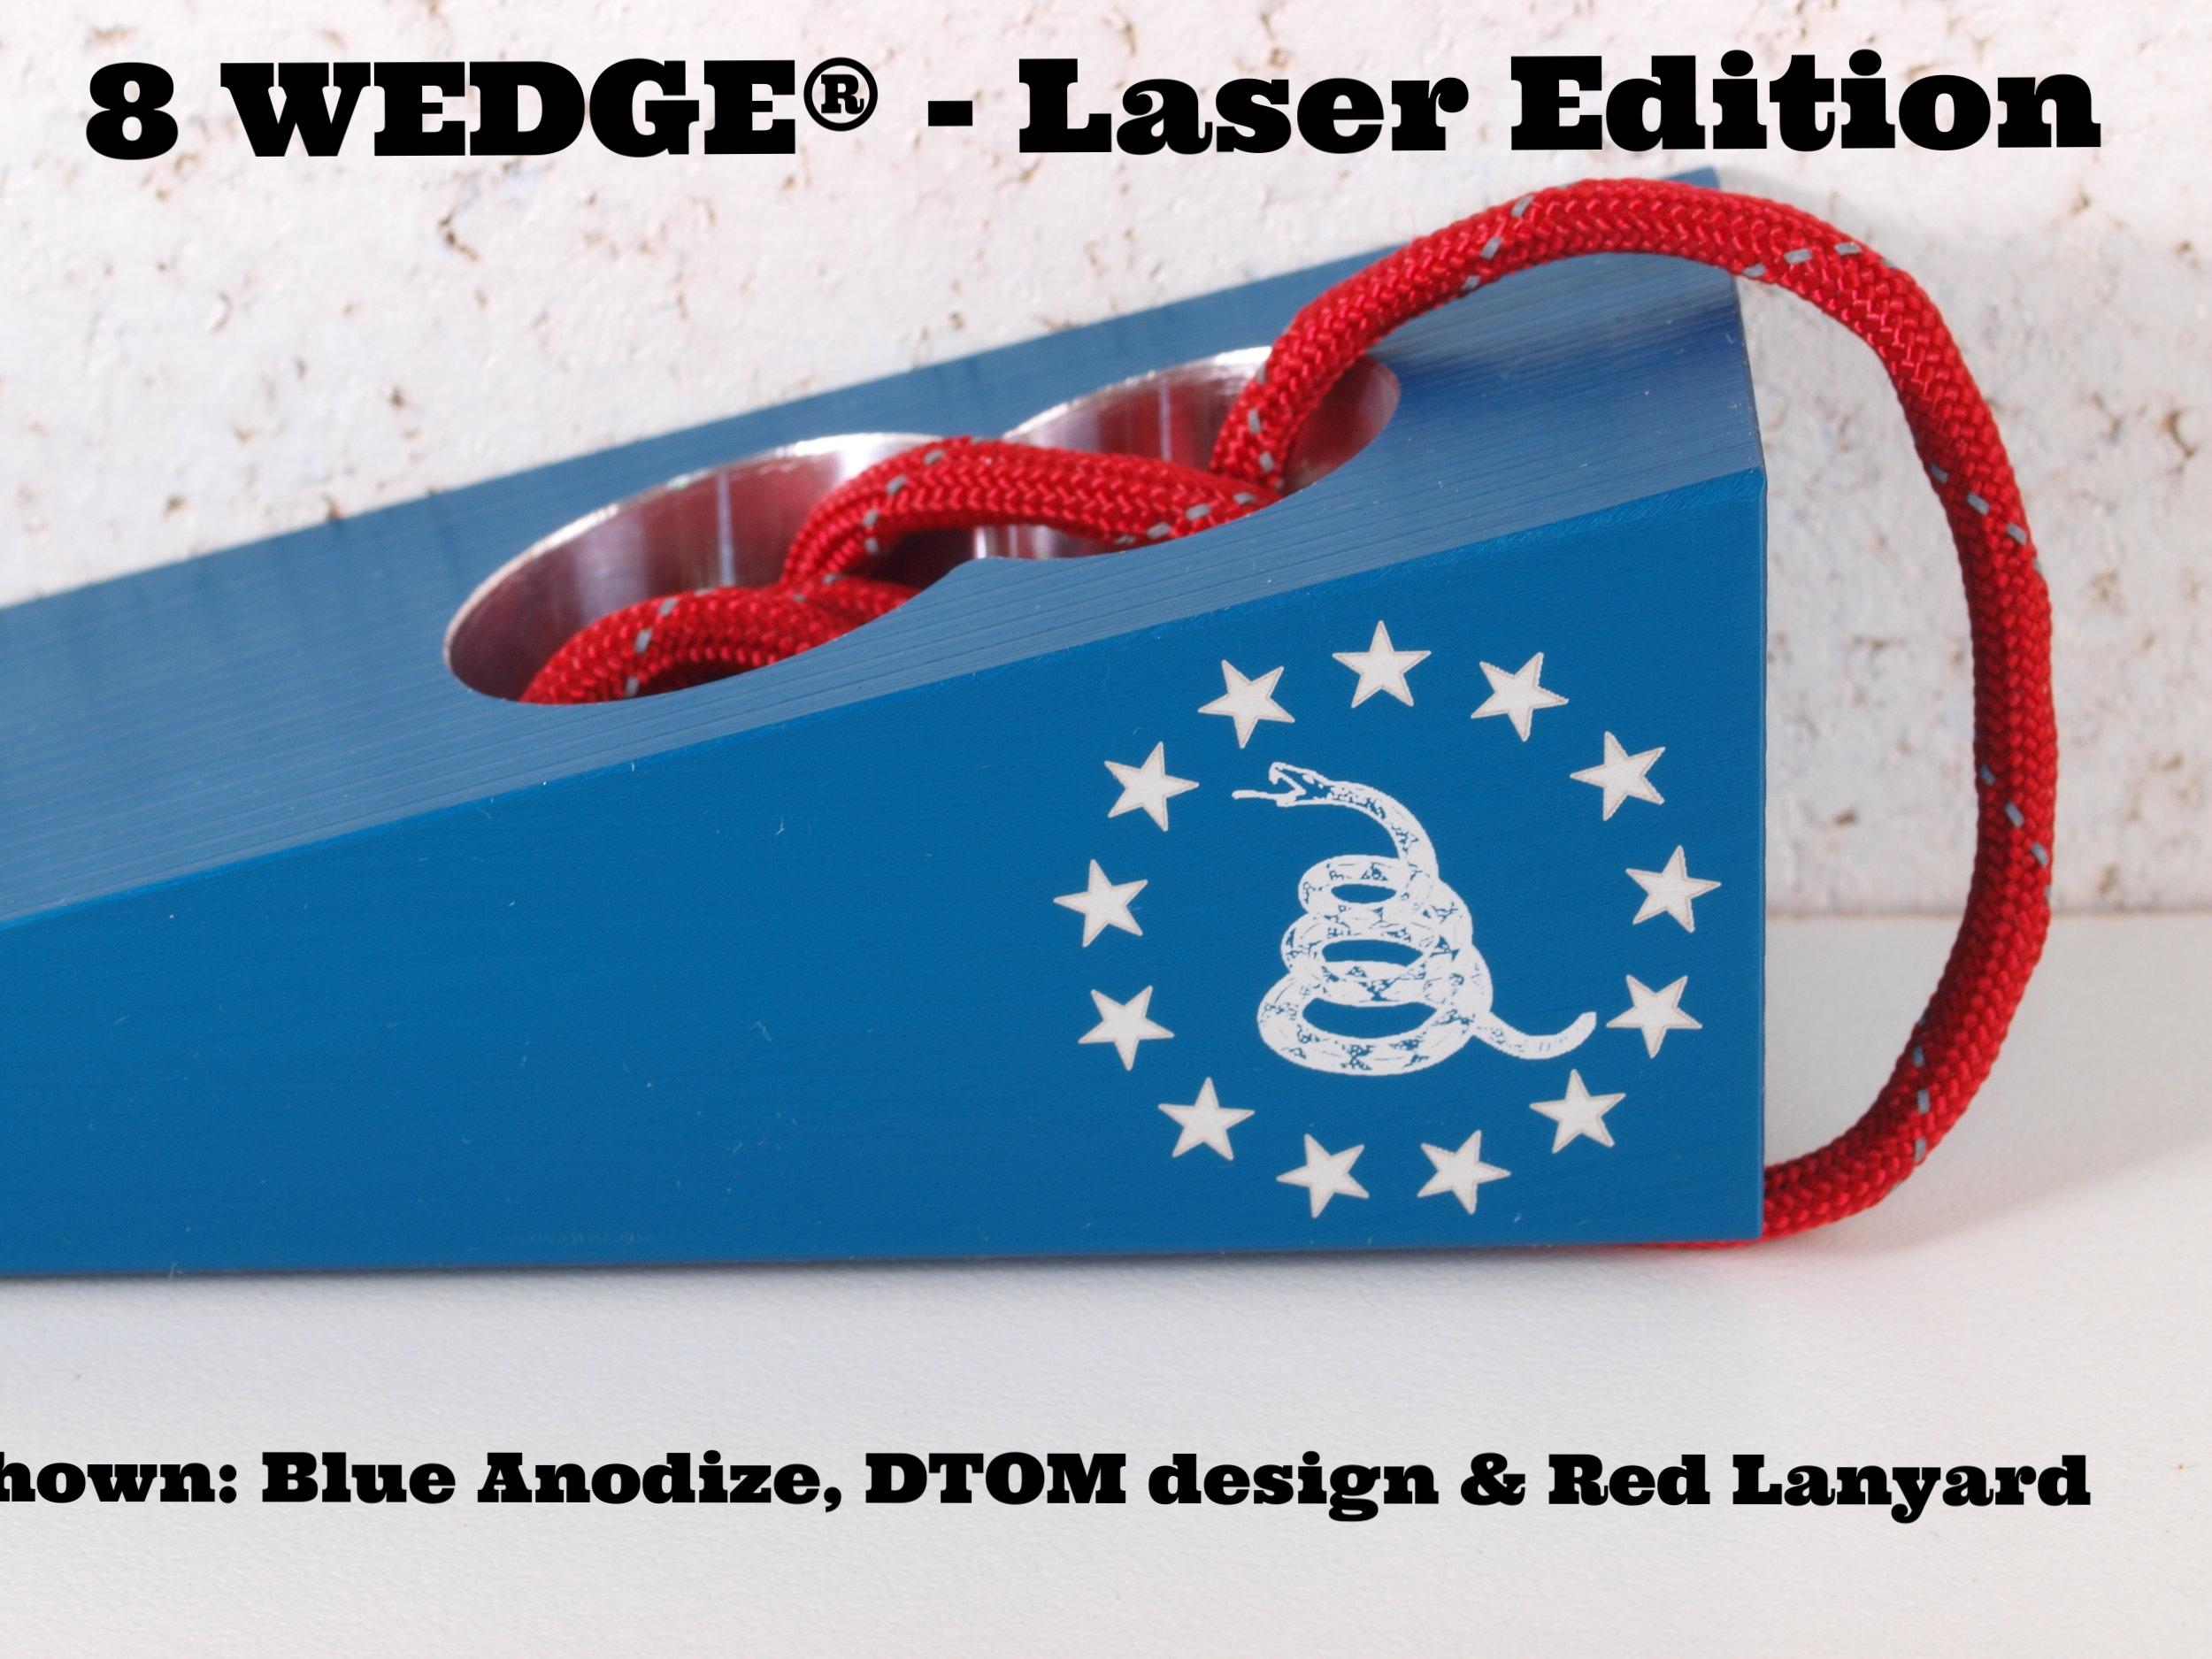 8 WEDGE - Laser Edition